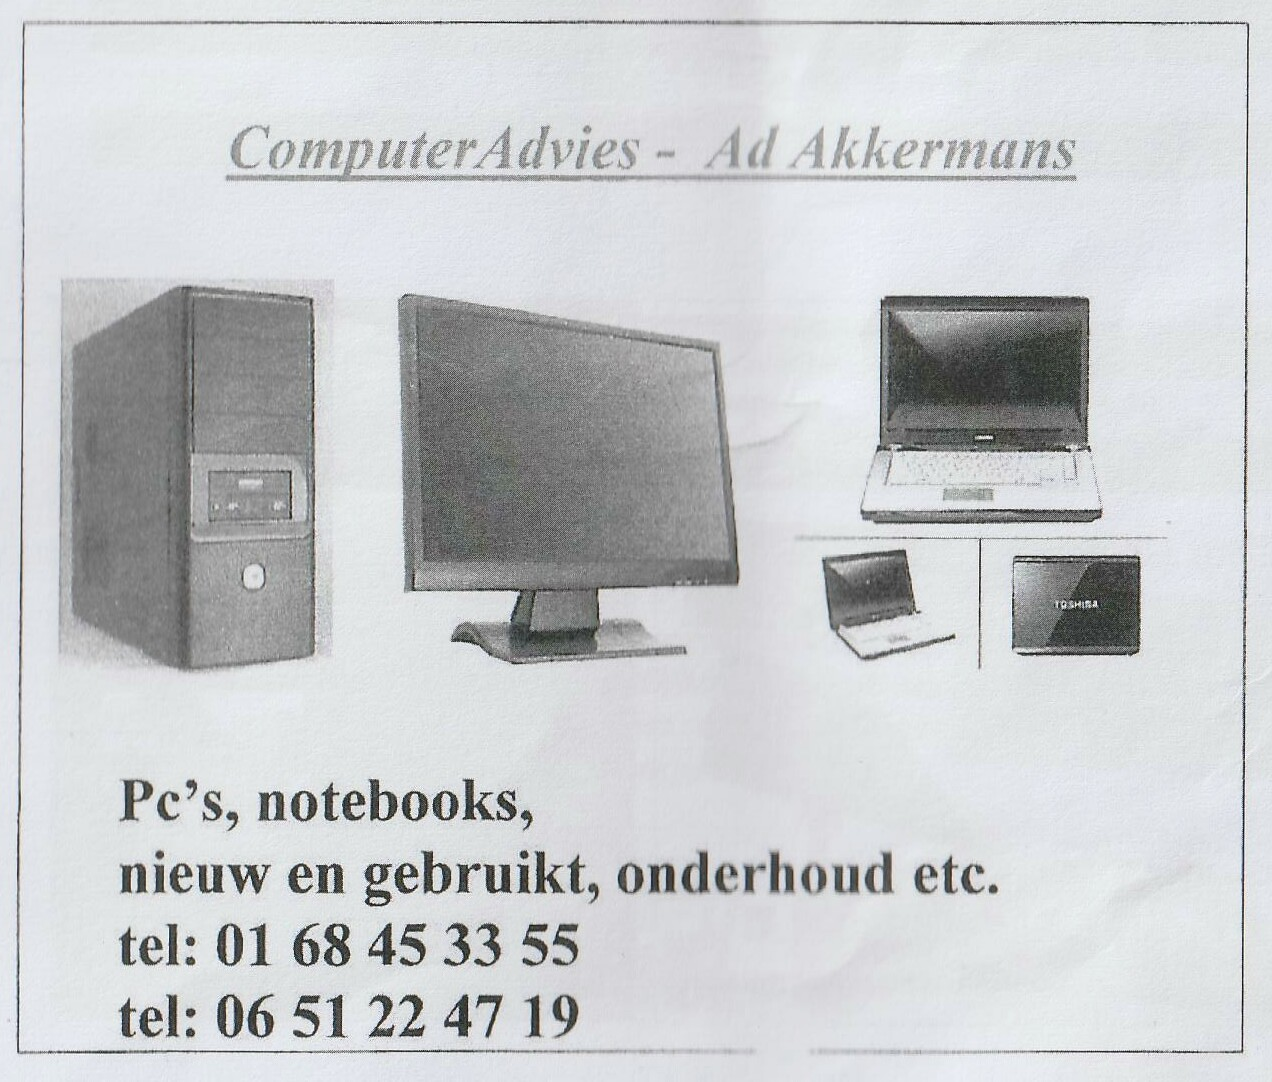 Ad Akkermans